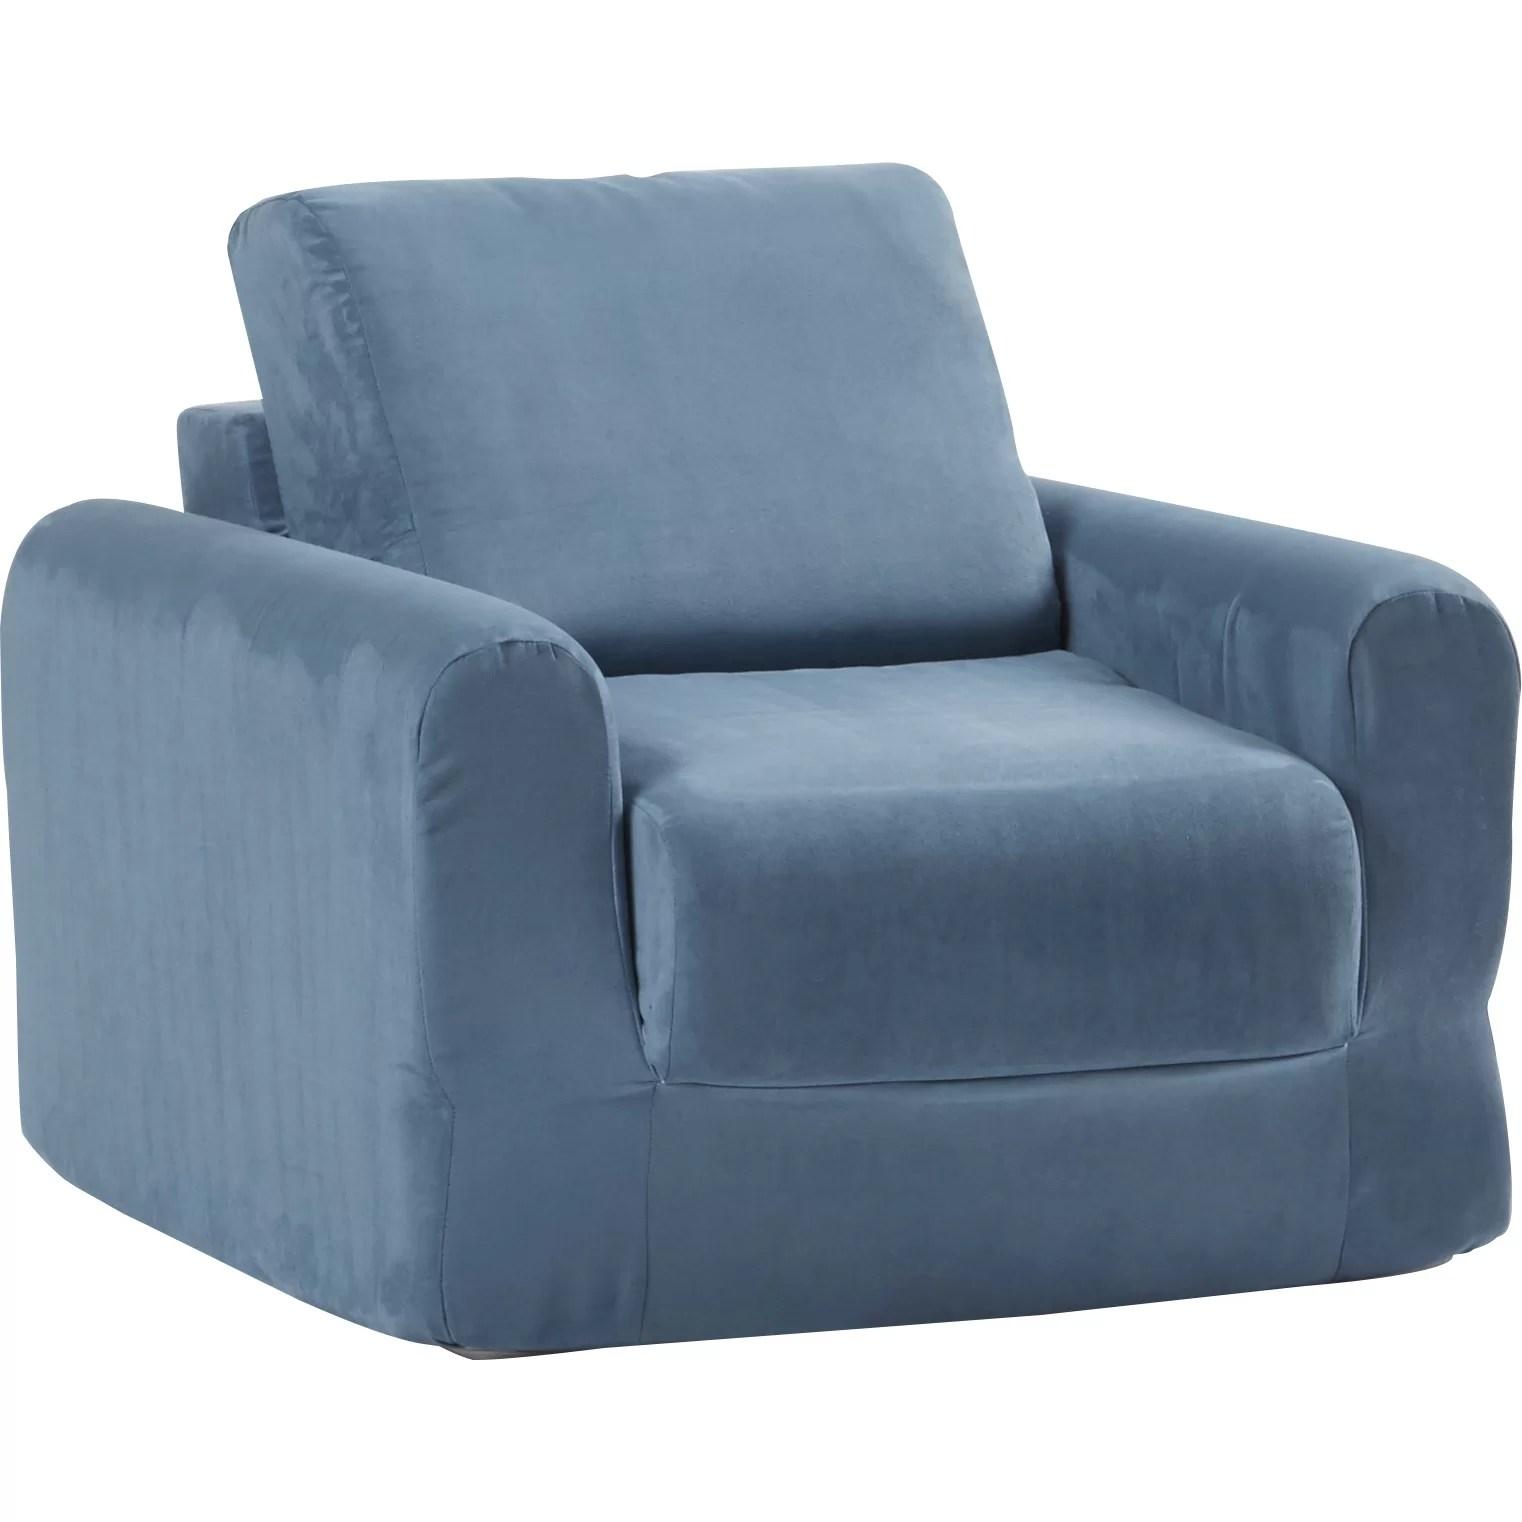 Fun Furnishings Child Sleeper Chair & Reviews